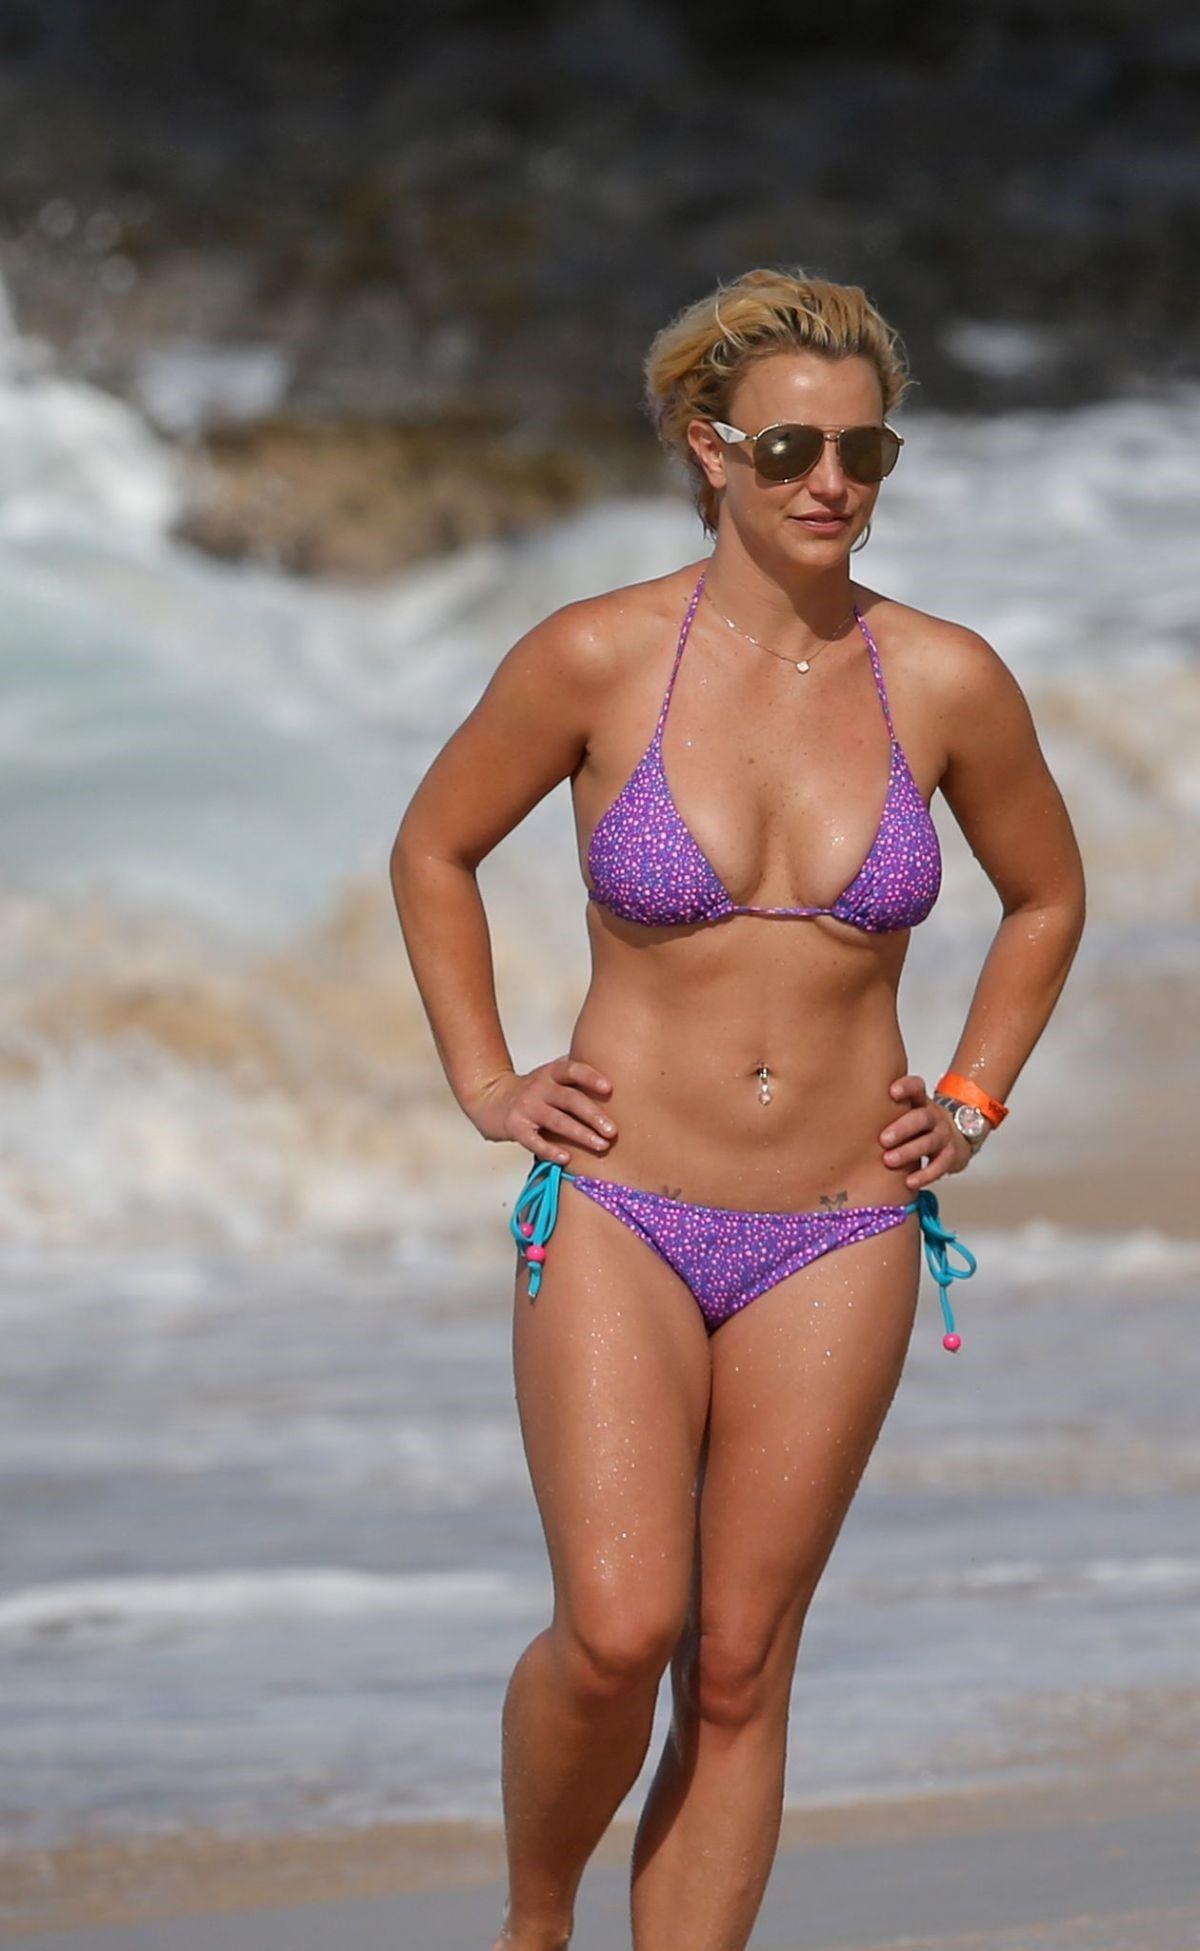 Britney Spears Bikini Photos